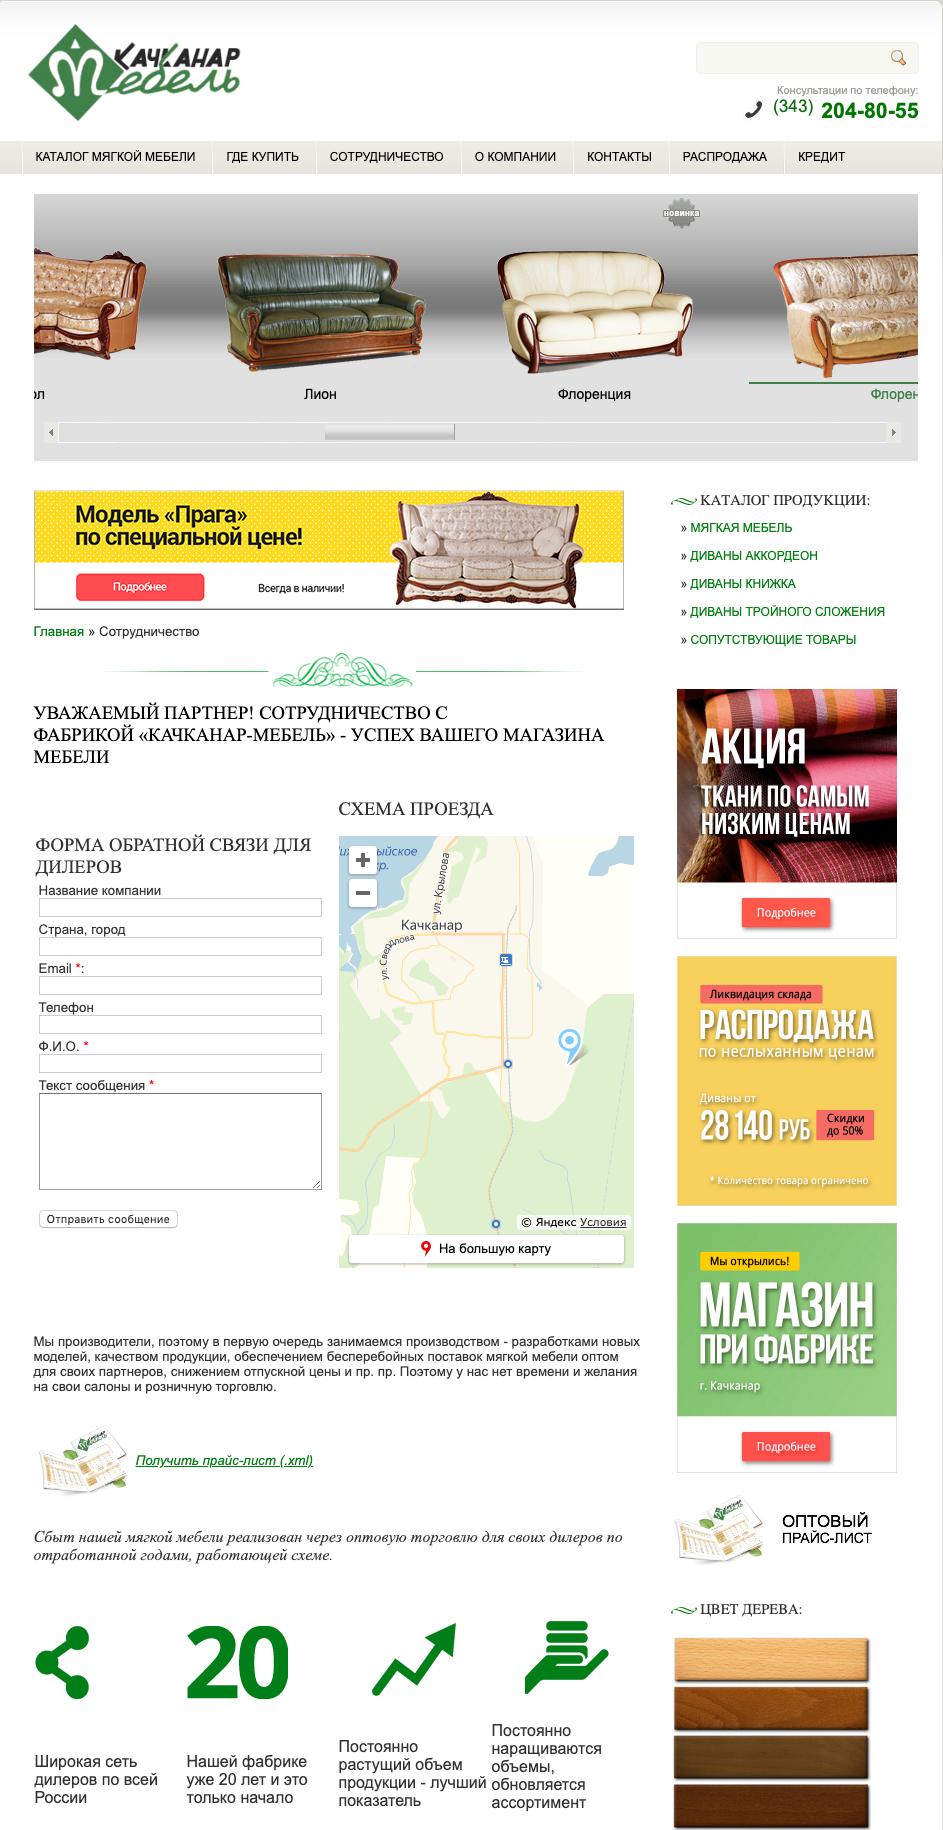 FireShot Capture 093 - «Качканар-Мебель» - мягкая мебель оптом - kachmebel.ru